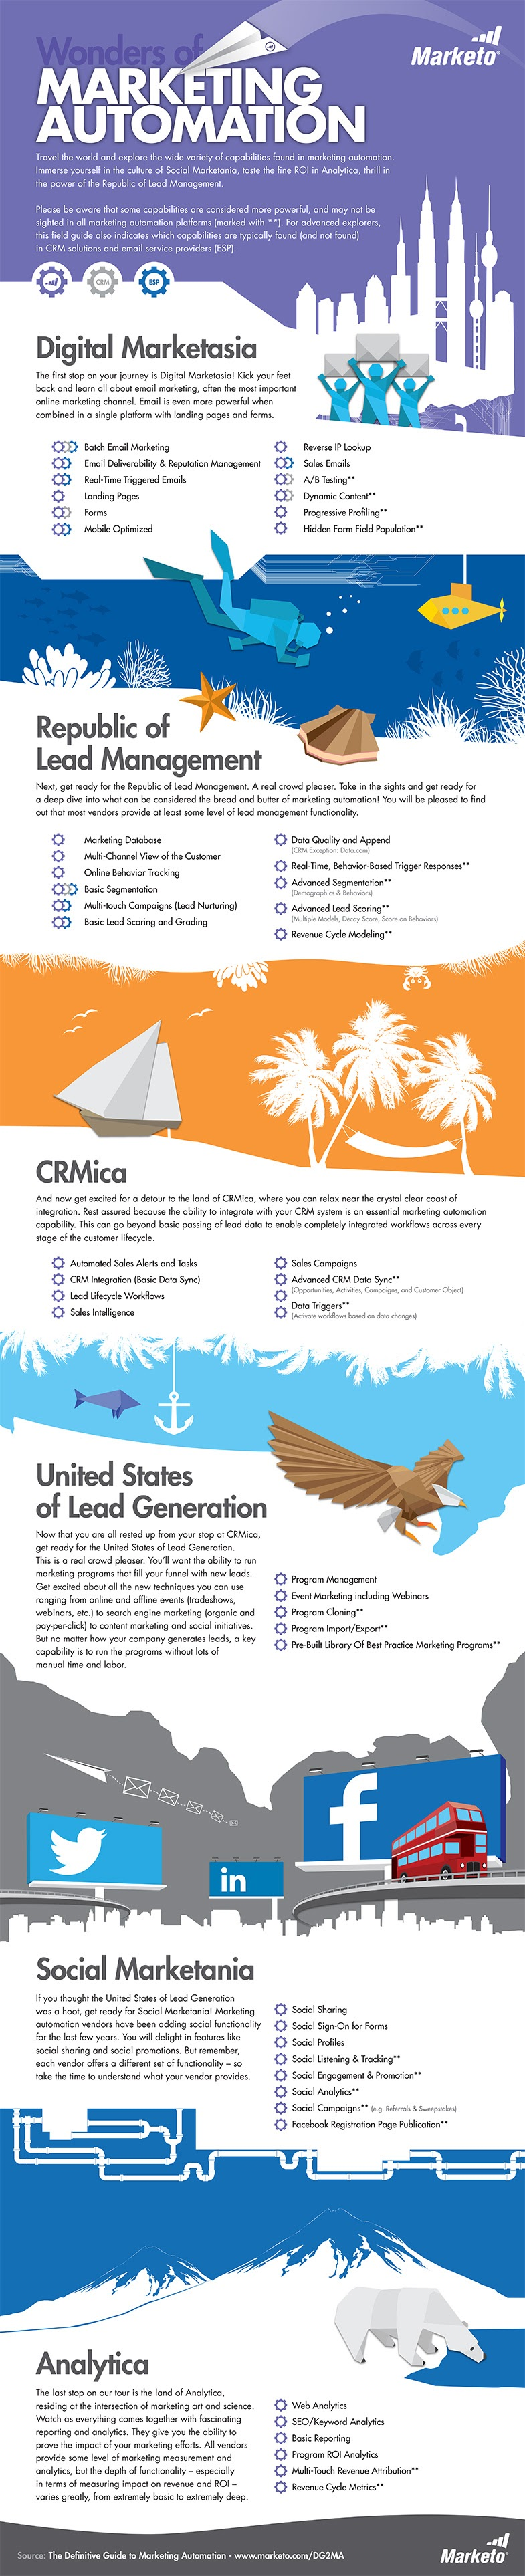 World Of Marketing Automation #Infographic